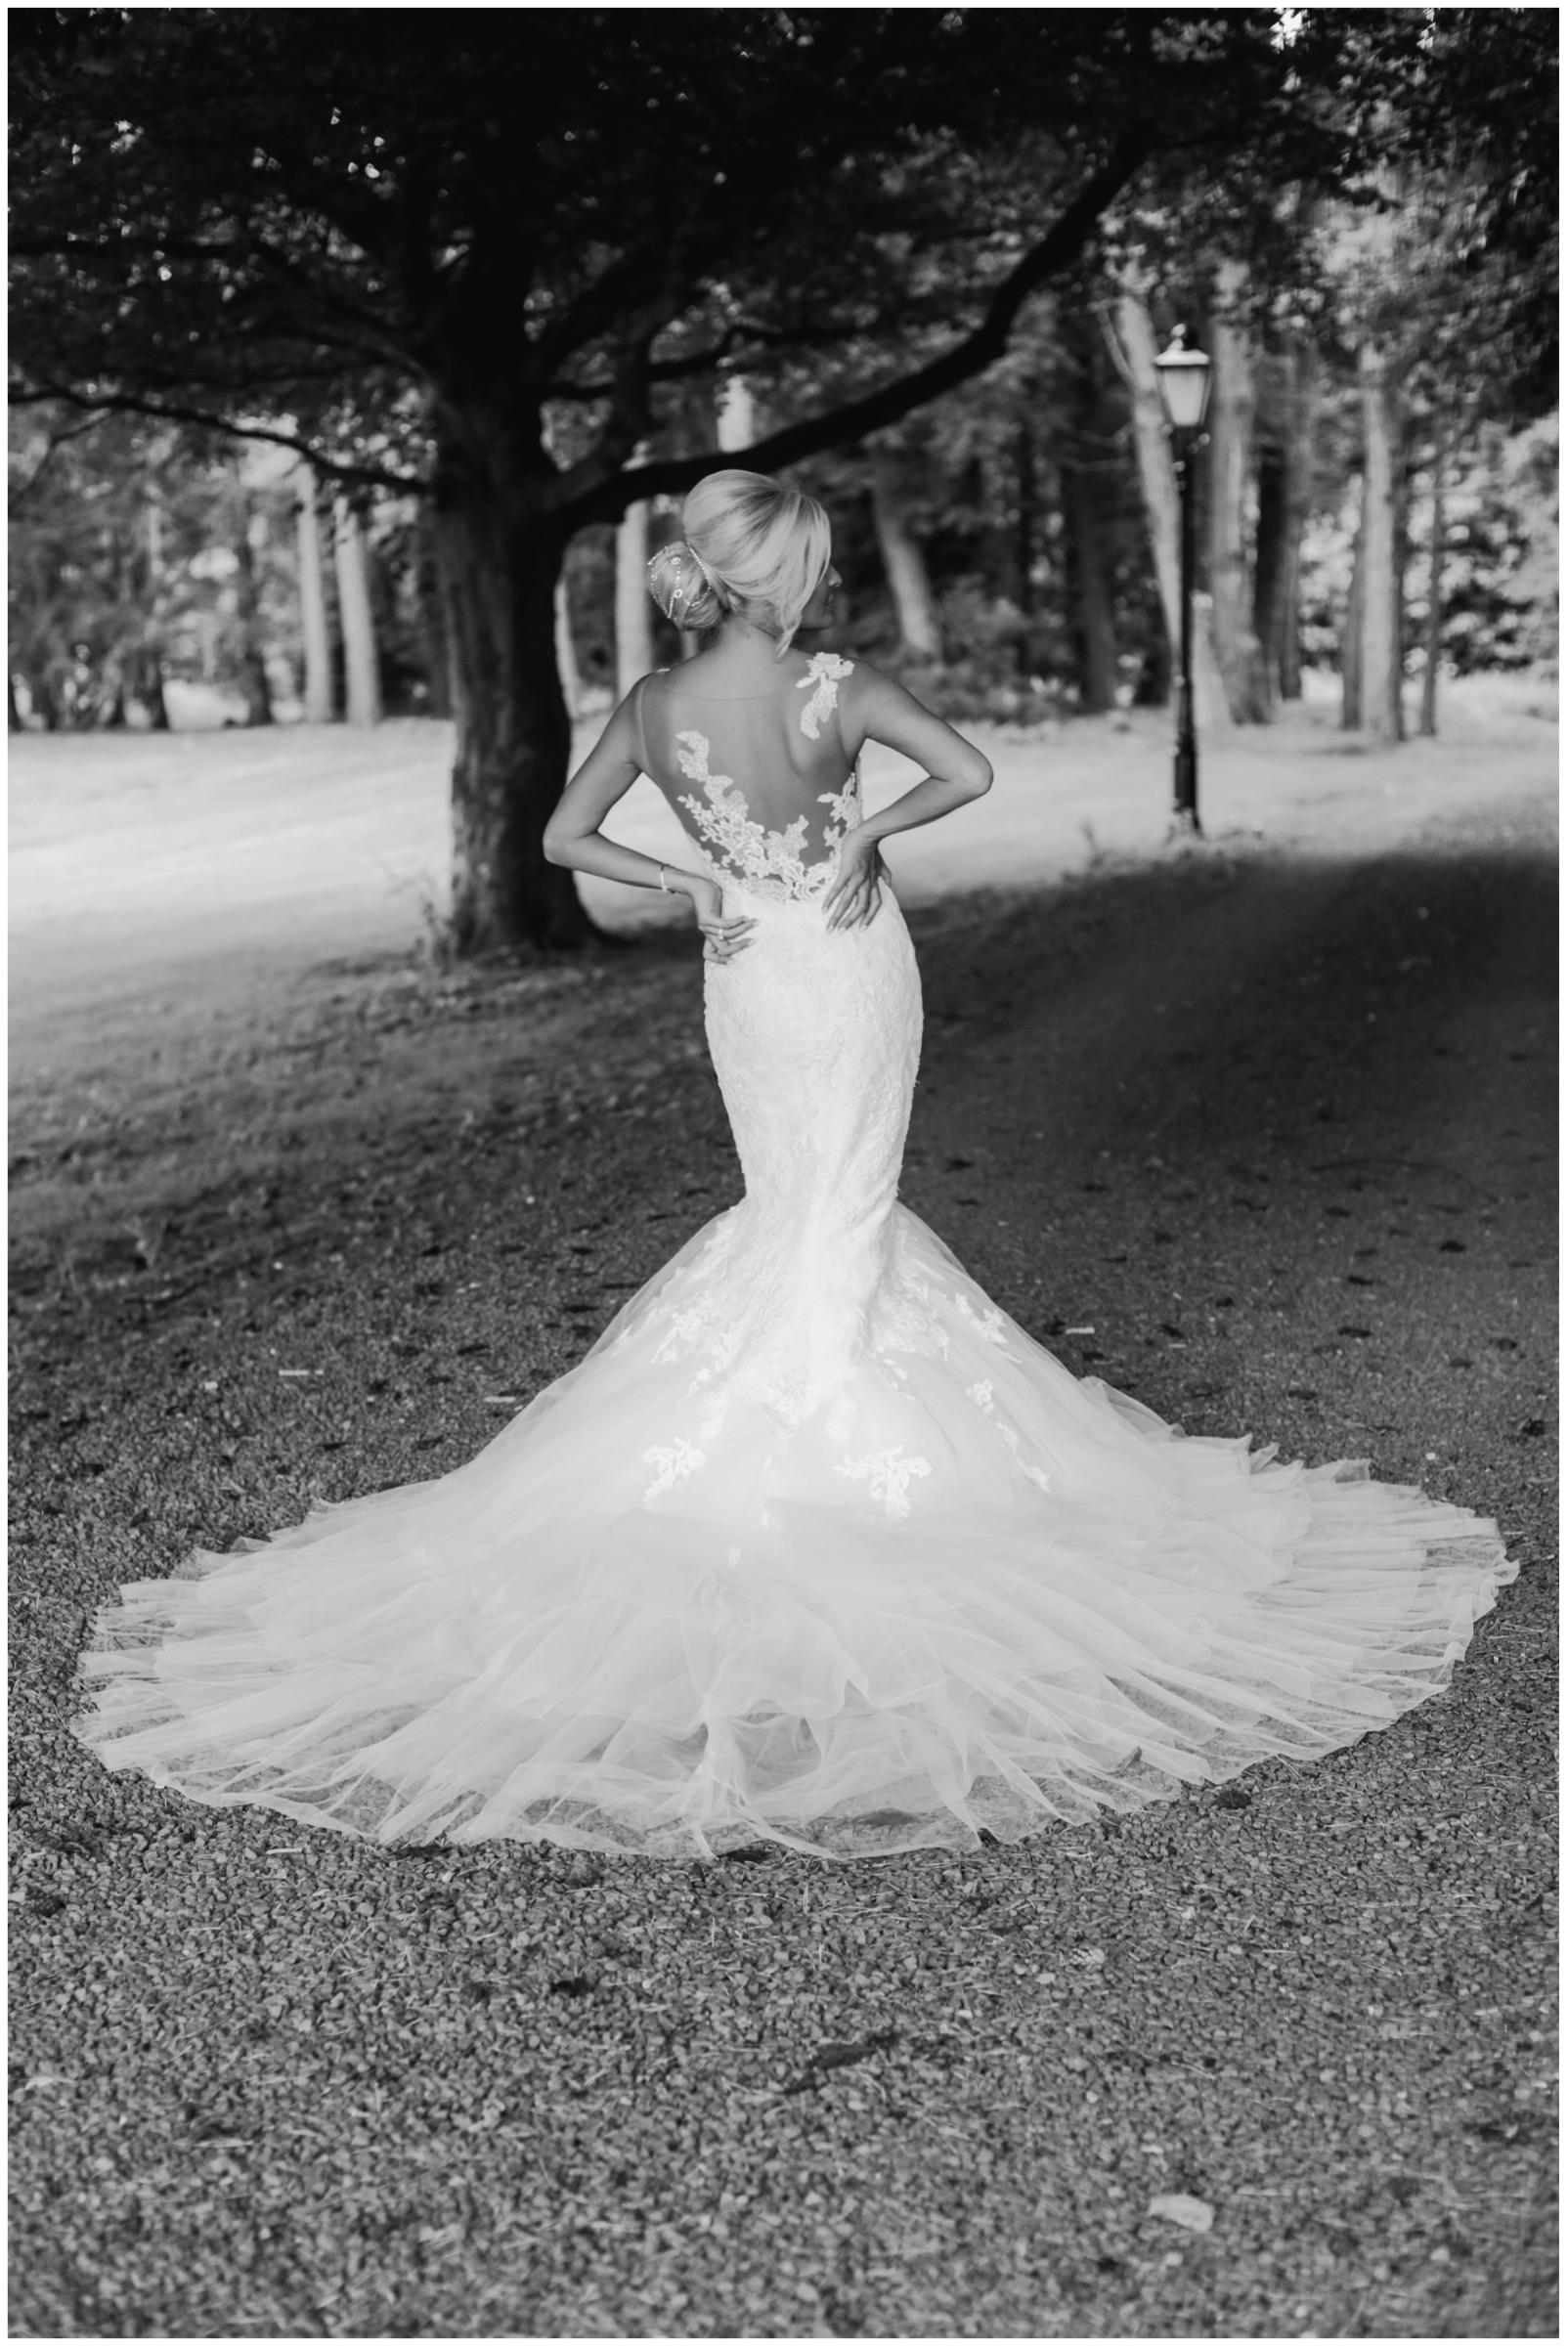 Bride in mermaid wedding dress on outside path